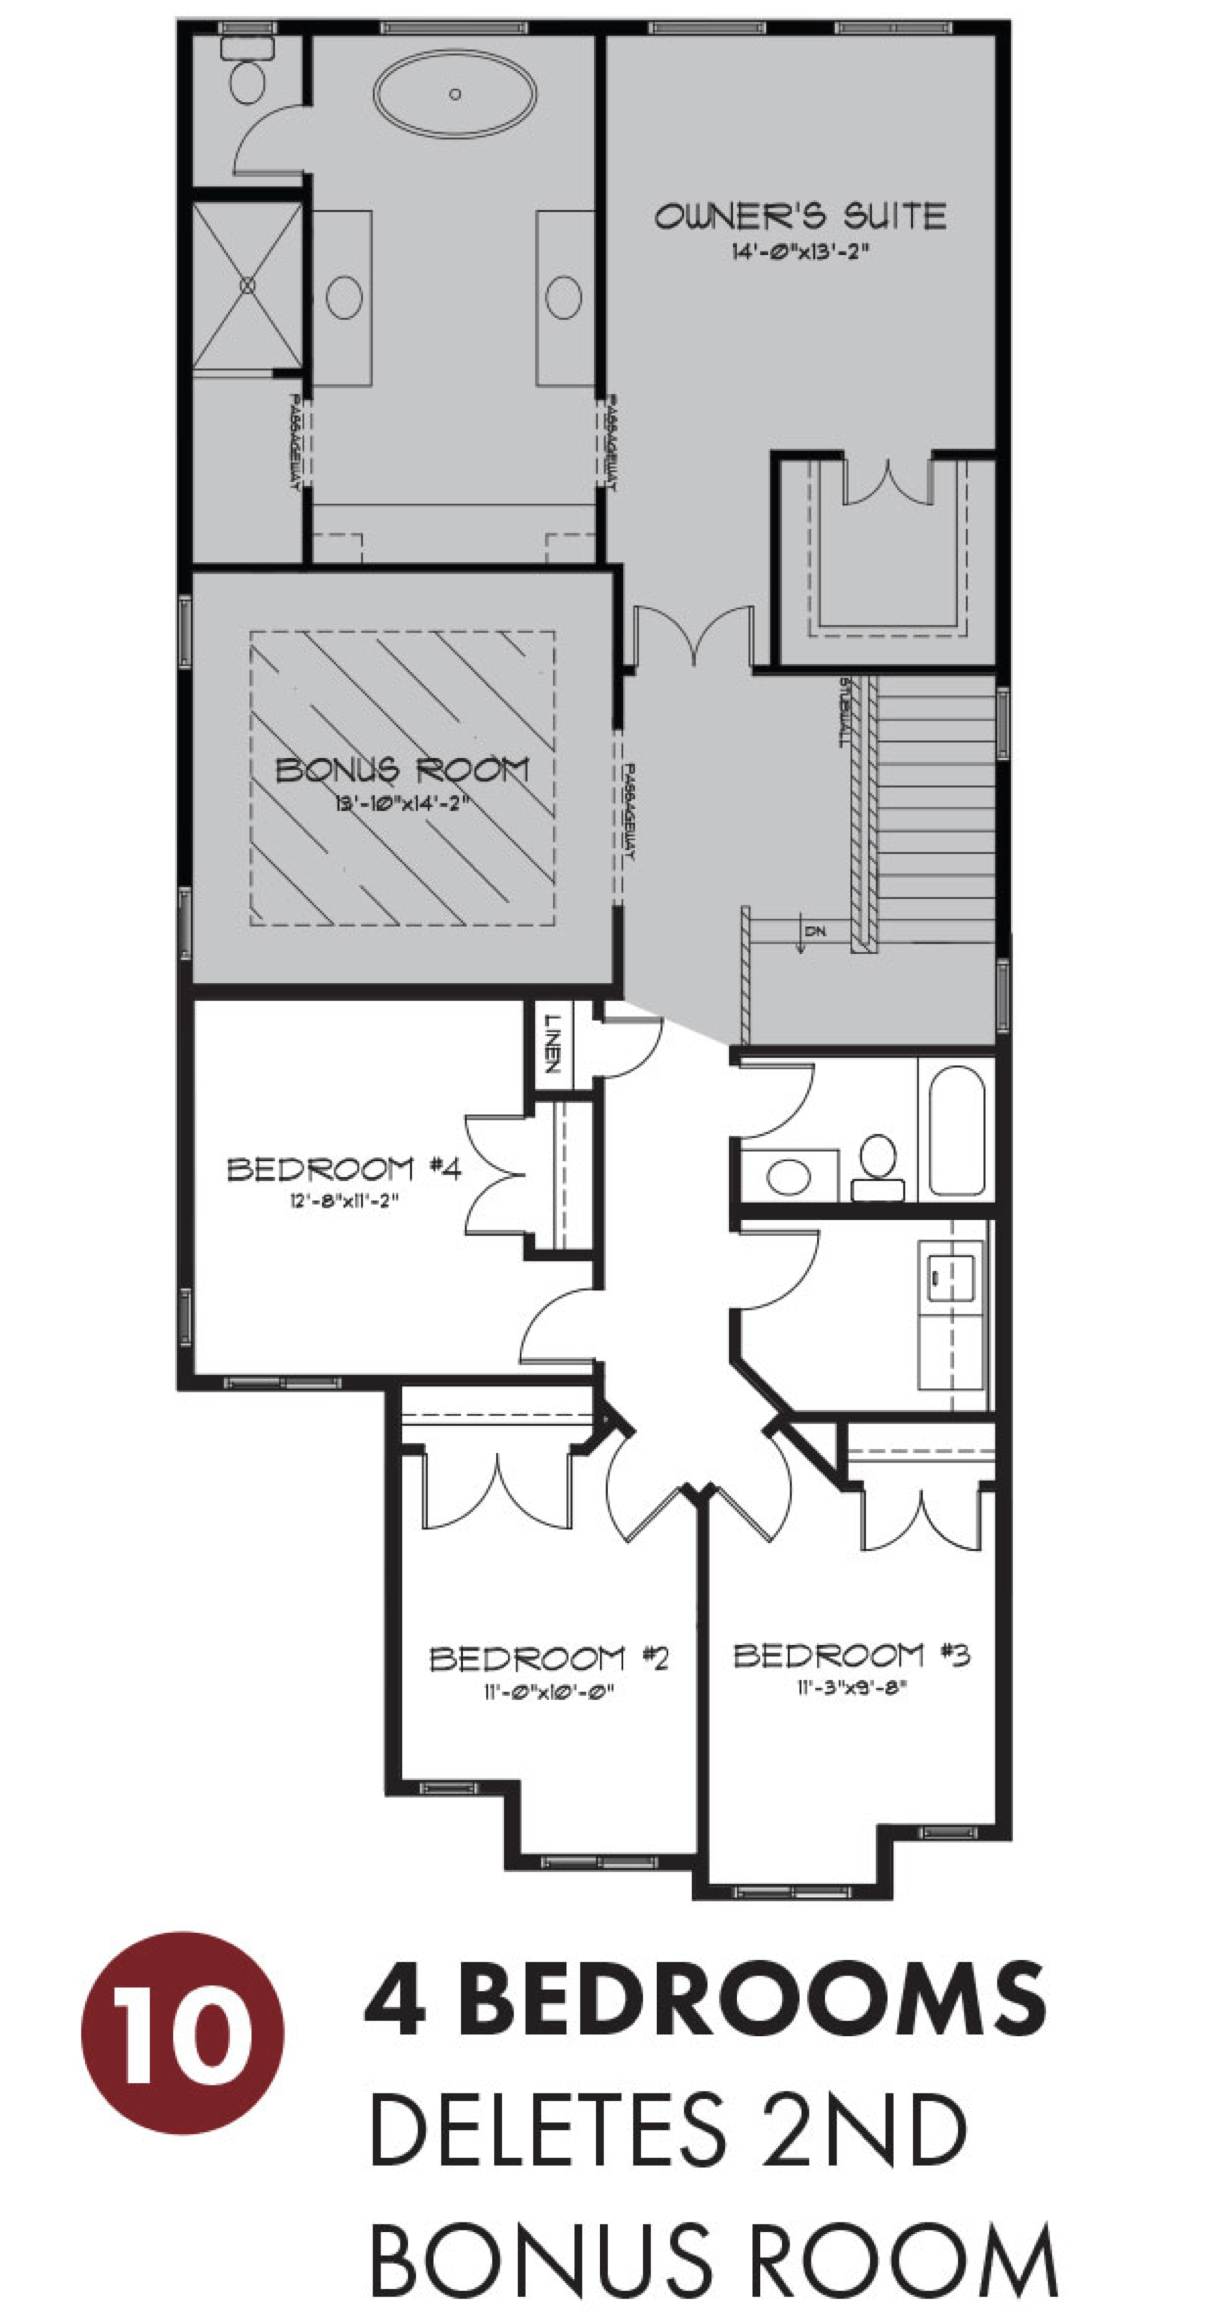 ideal-home-models-multi-generational-families-georgia-image.png